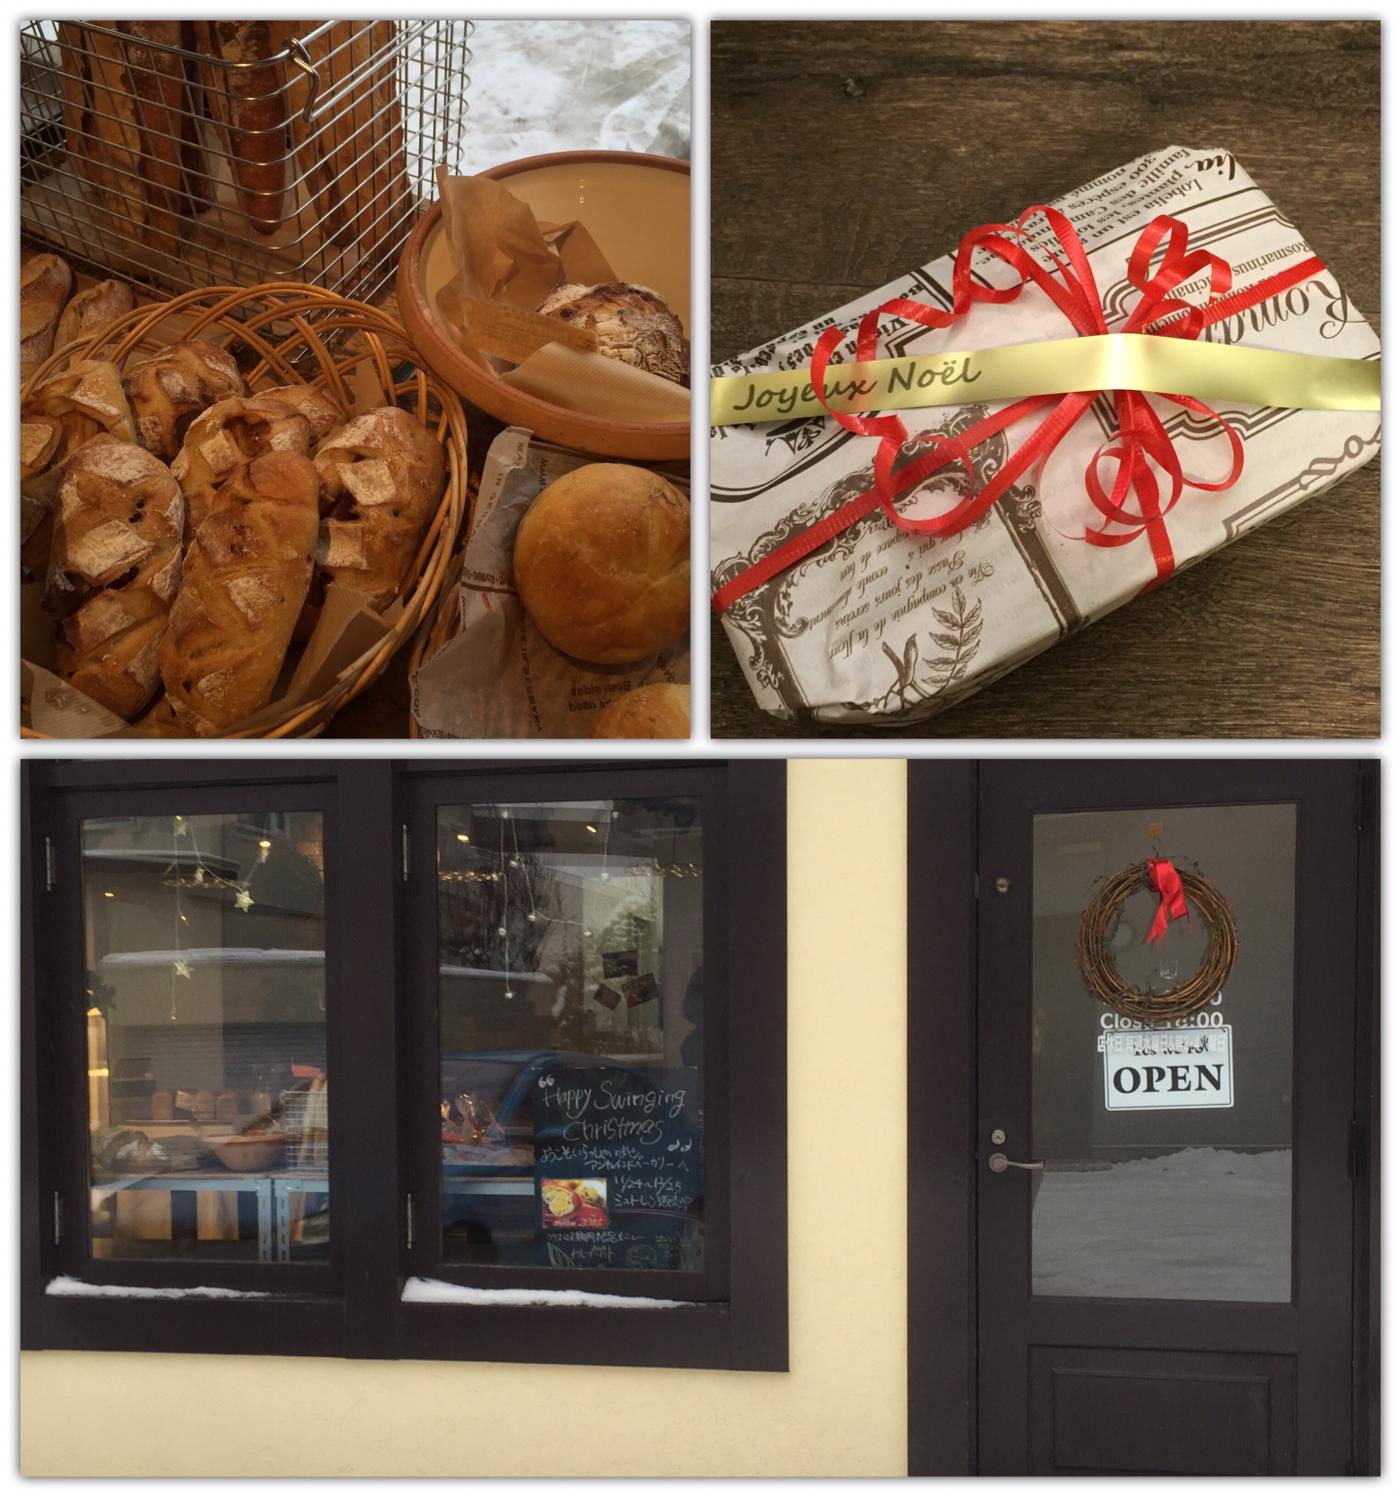 「UNCHAINEDbakery(アンチェインドベーカリー)」 住宅街にそっと建つ素敵なパン屋さん【札幌 西区 宮の沢】